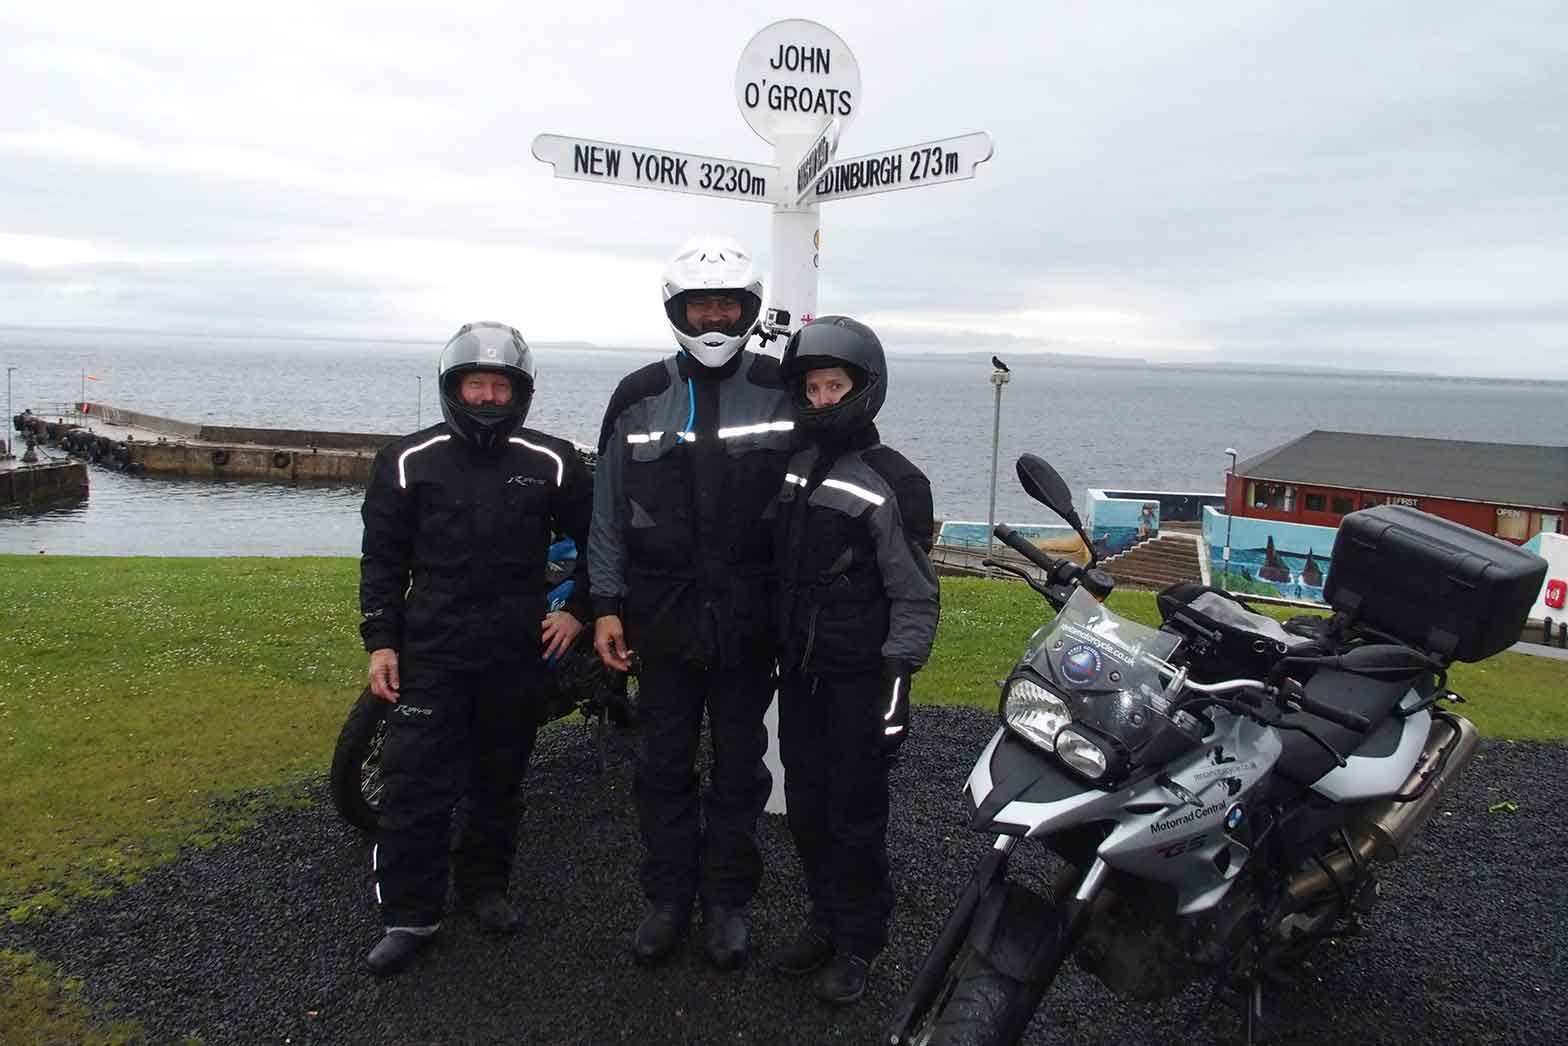 John O'Groats, Northern tip of Scotland